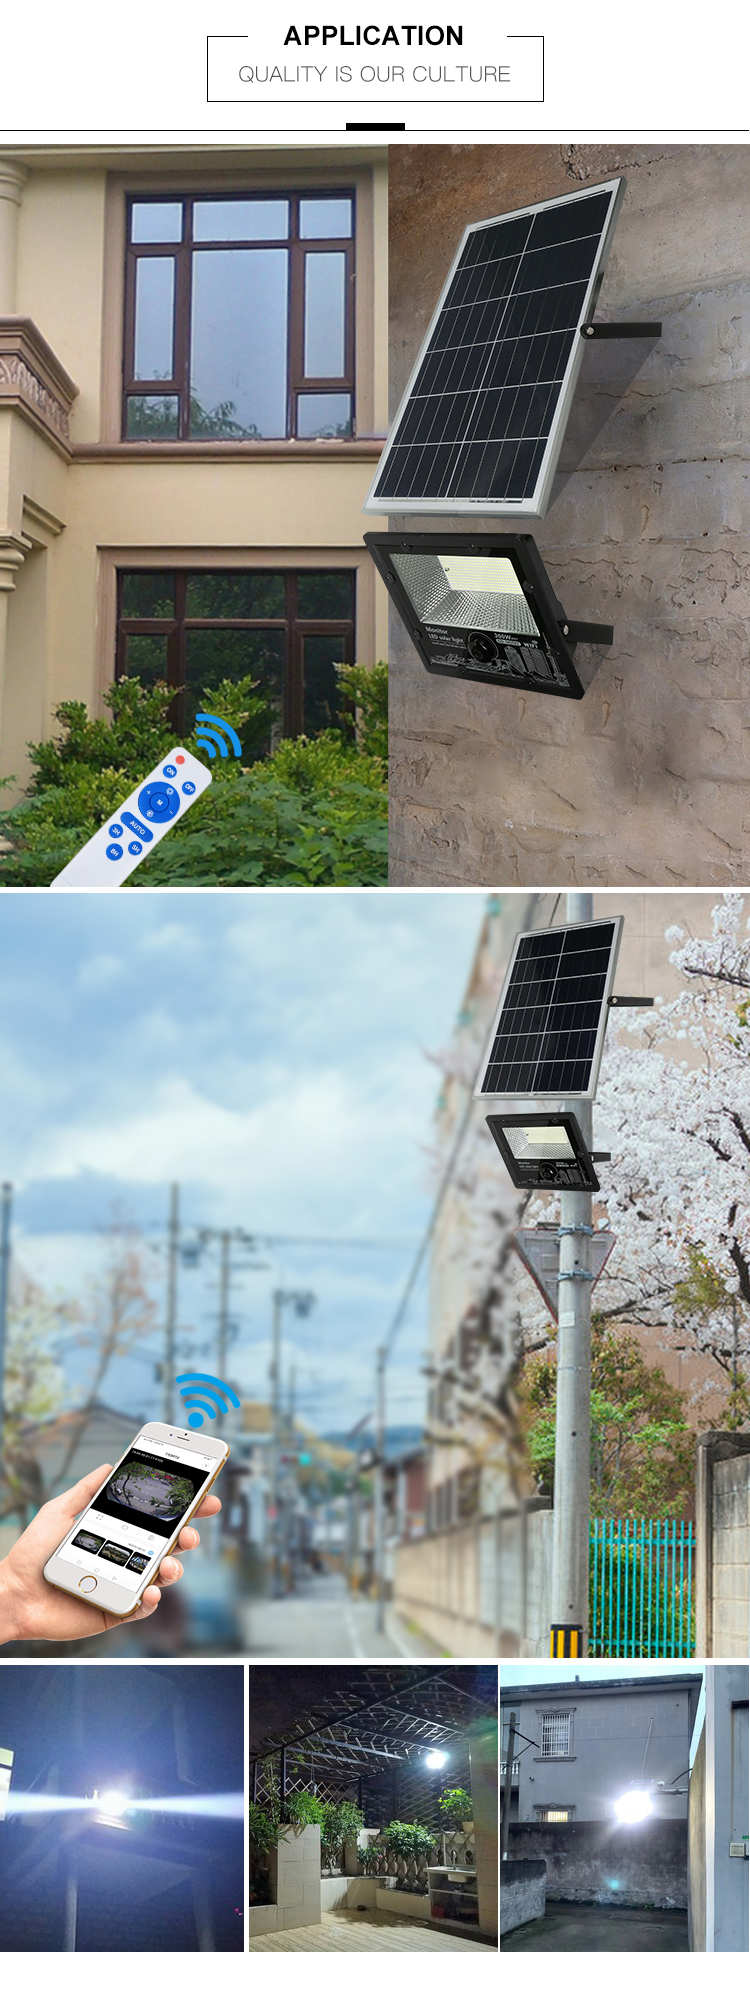 Süper parlak IP67 su geçirmez dış mekan alüminyum SMD 200w 300w 400w güneş led projektör